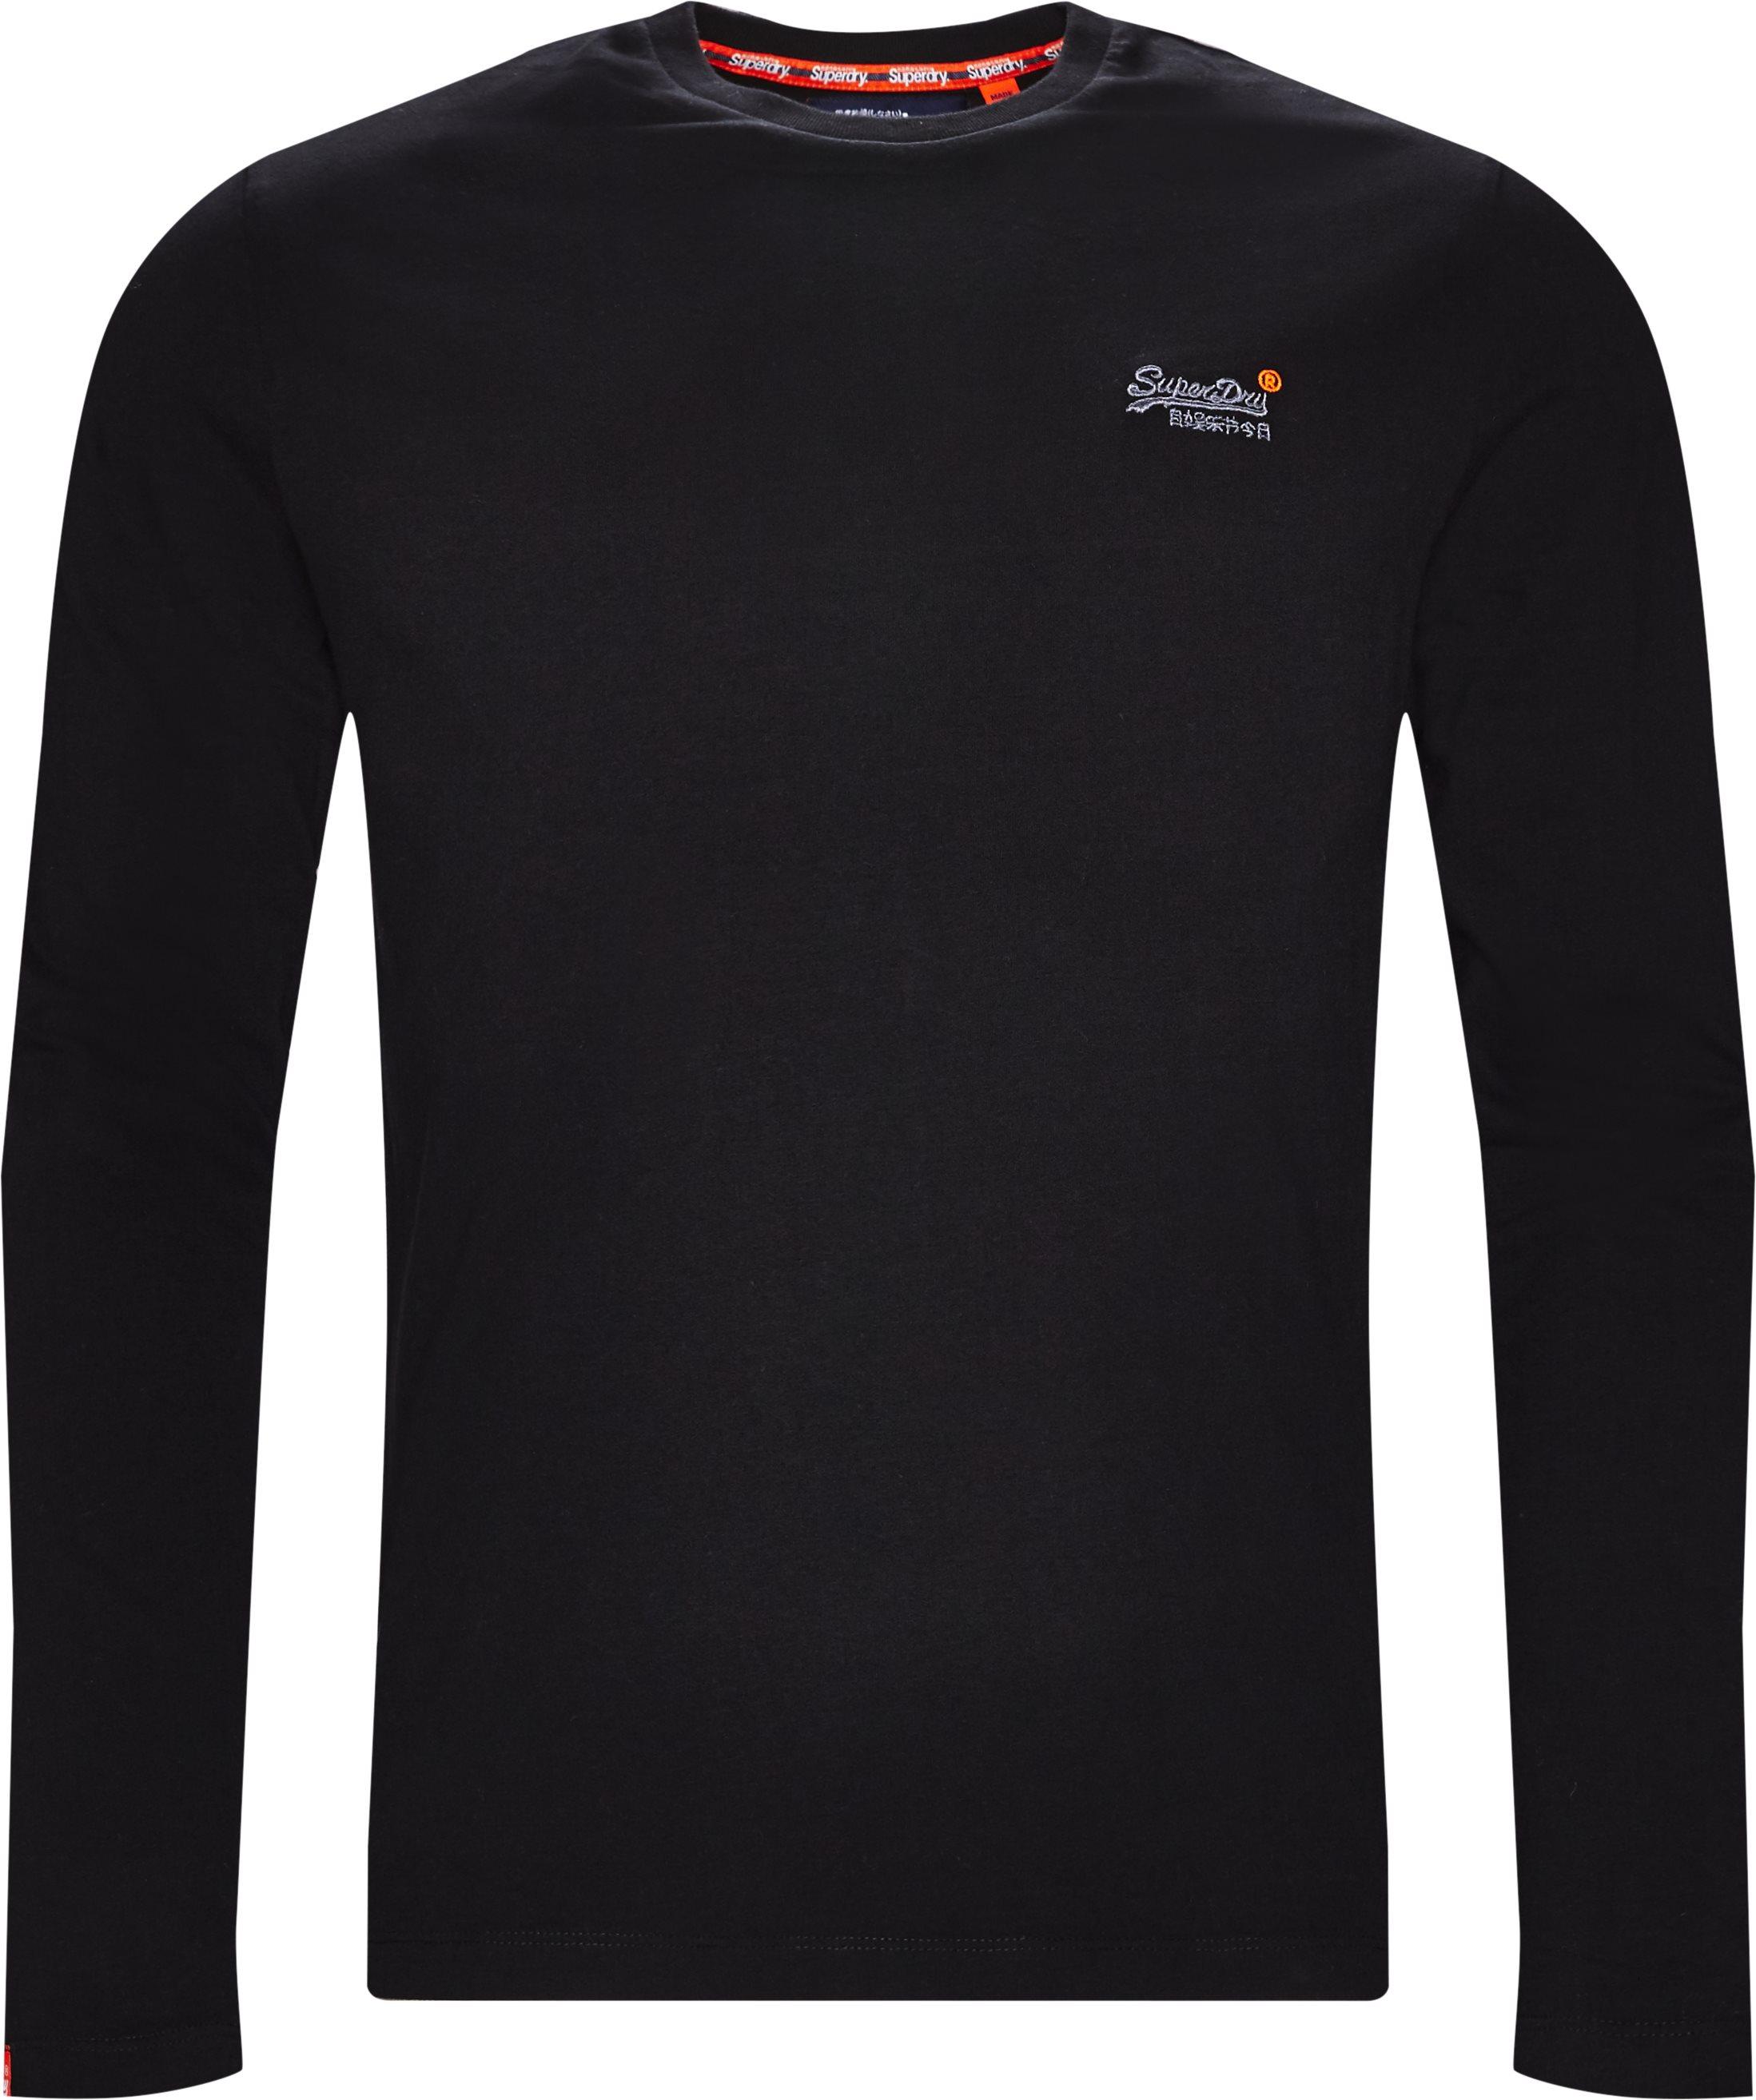 M6000 LS Tee - T-shirts - Regular fit - Sort